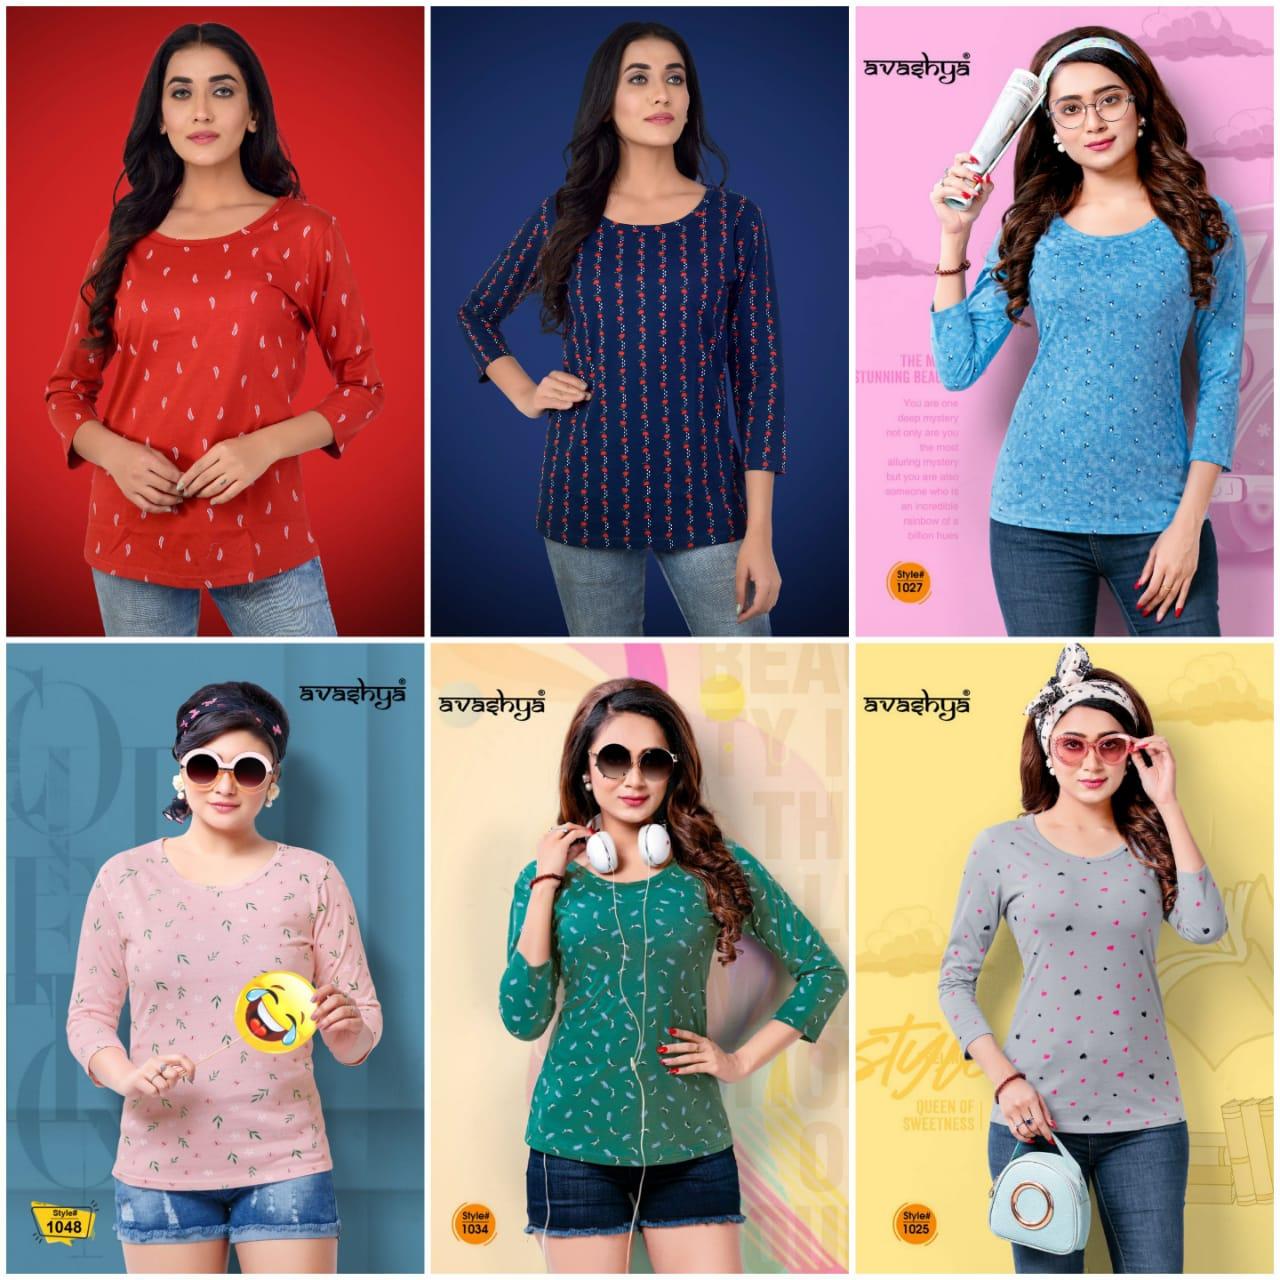 Avashya Retro Vol 55 T Shirt Wholesale Catalog 6 Pcs 7 - Avashya Retro Vol 55 T-Shirt Wholesale Catalog 6 Pcs